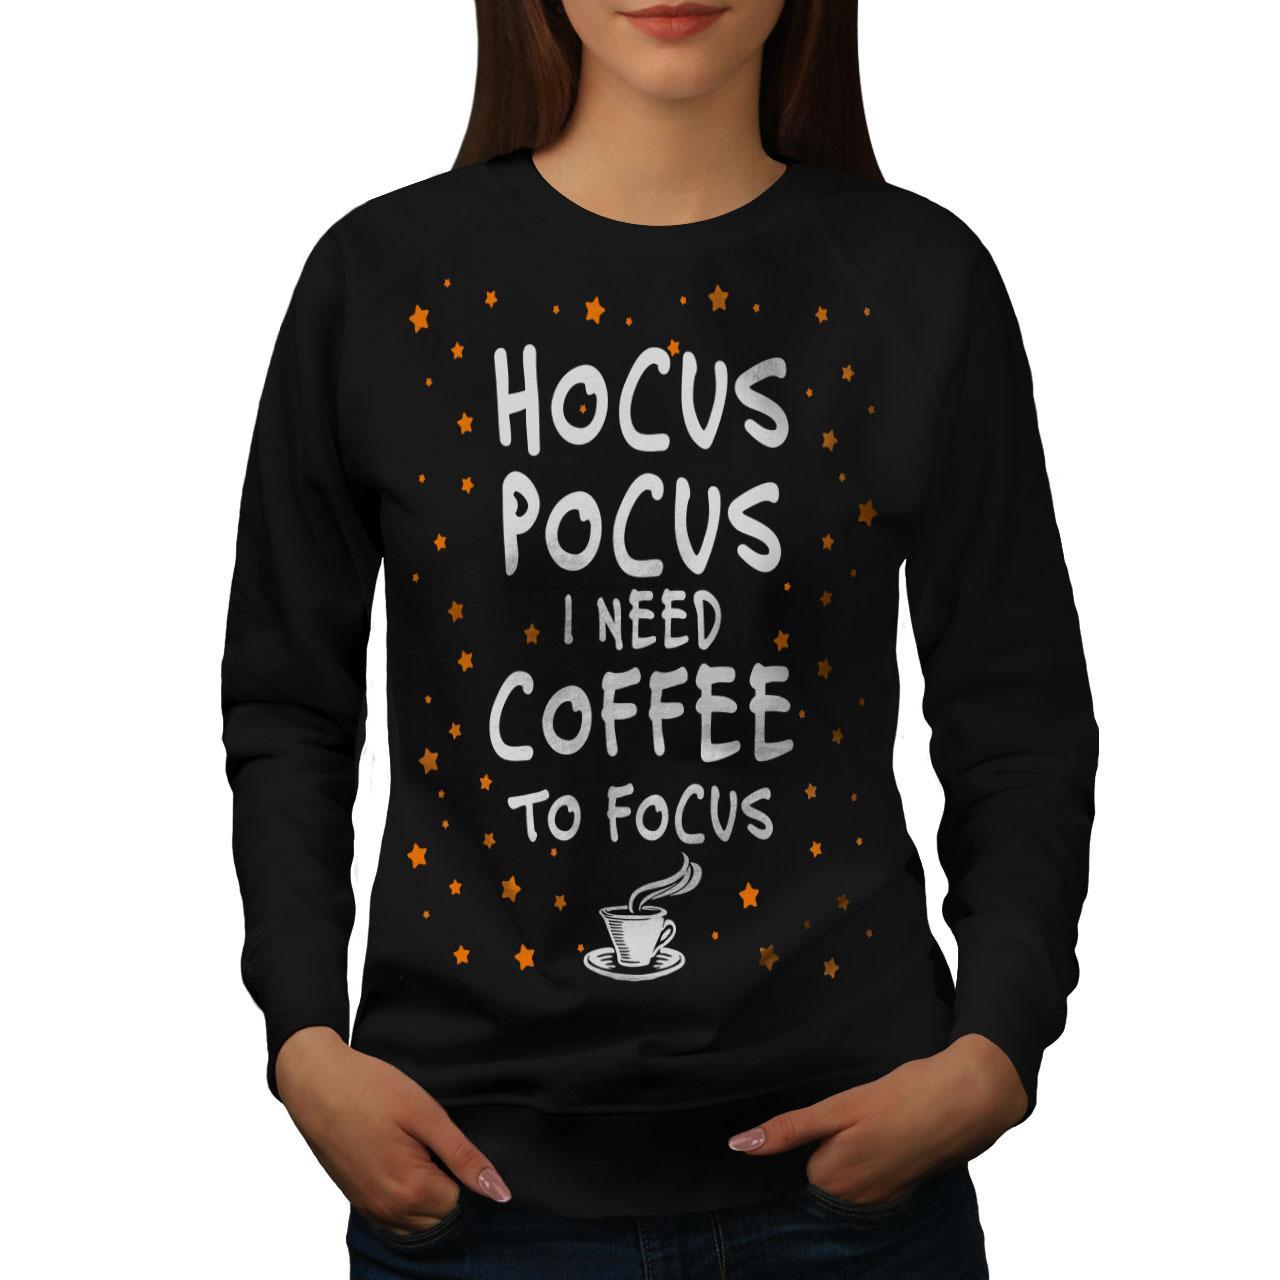 Hocus Magic Coffee Jumper Funny Women Sweatshirt - $18.99